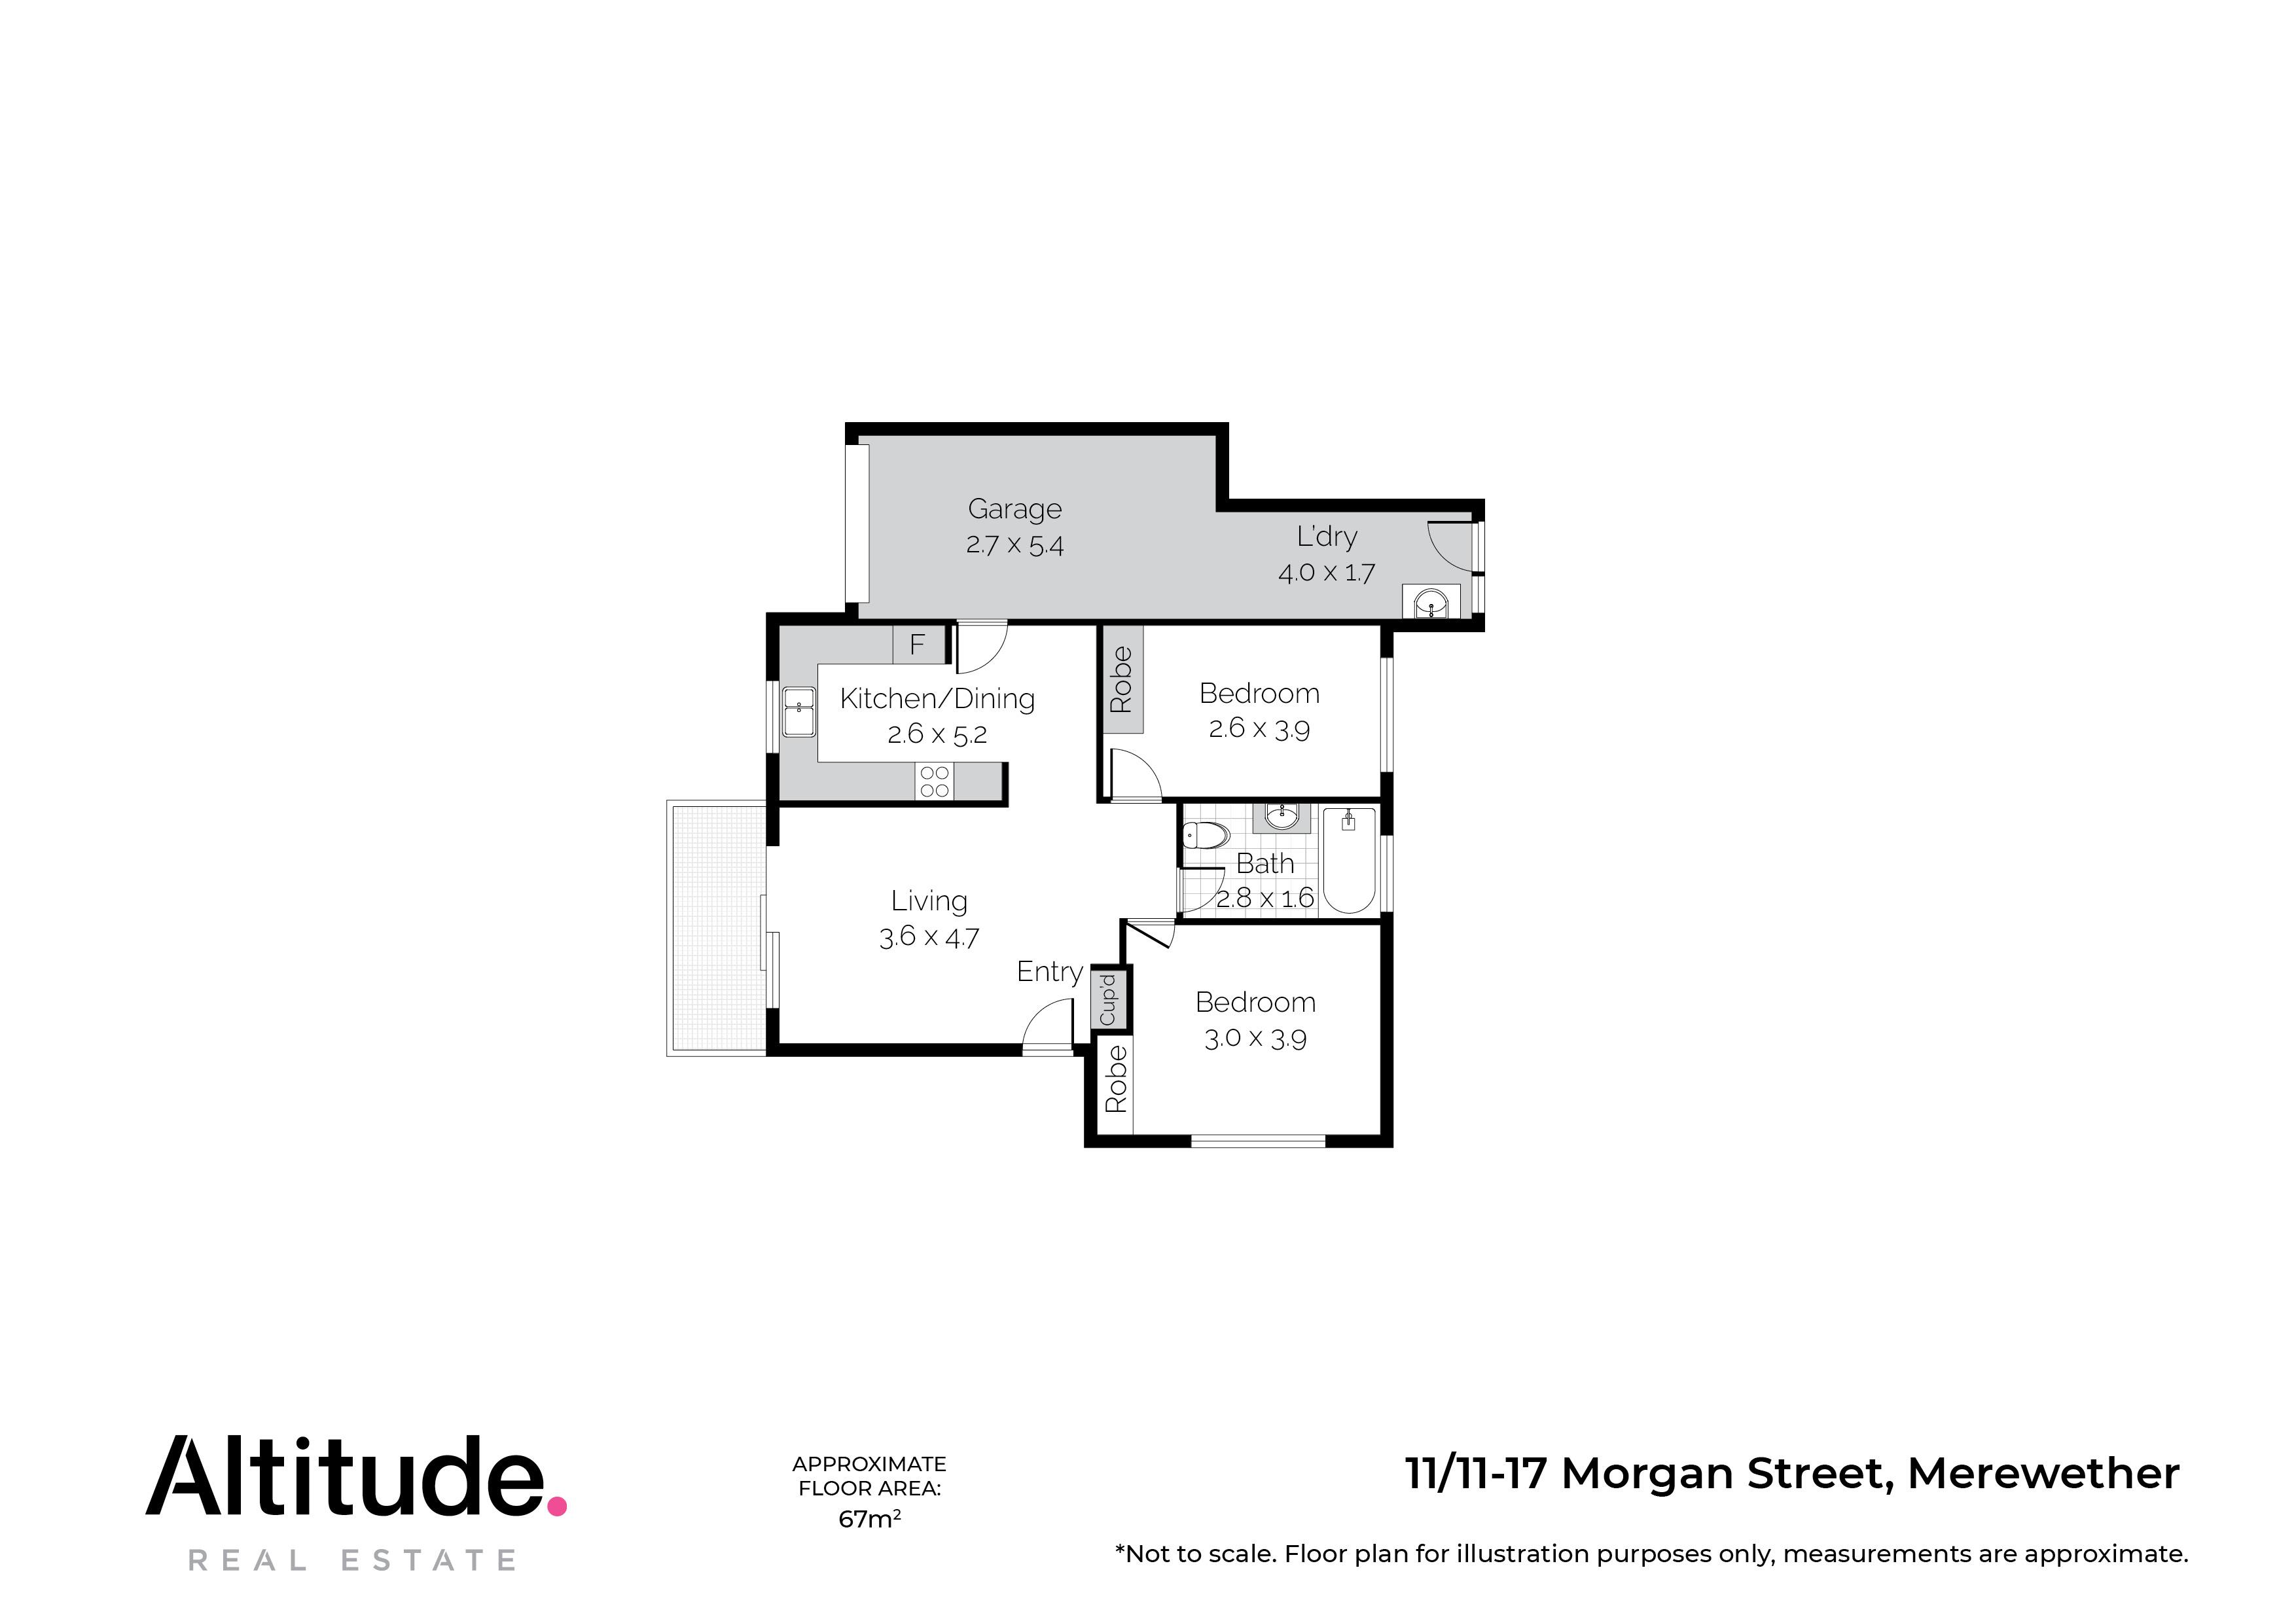 11/11-17 Morgan Street, Merewether, NSW 2291